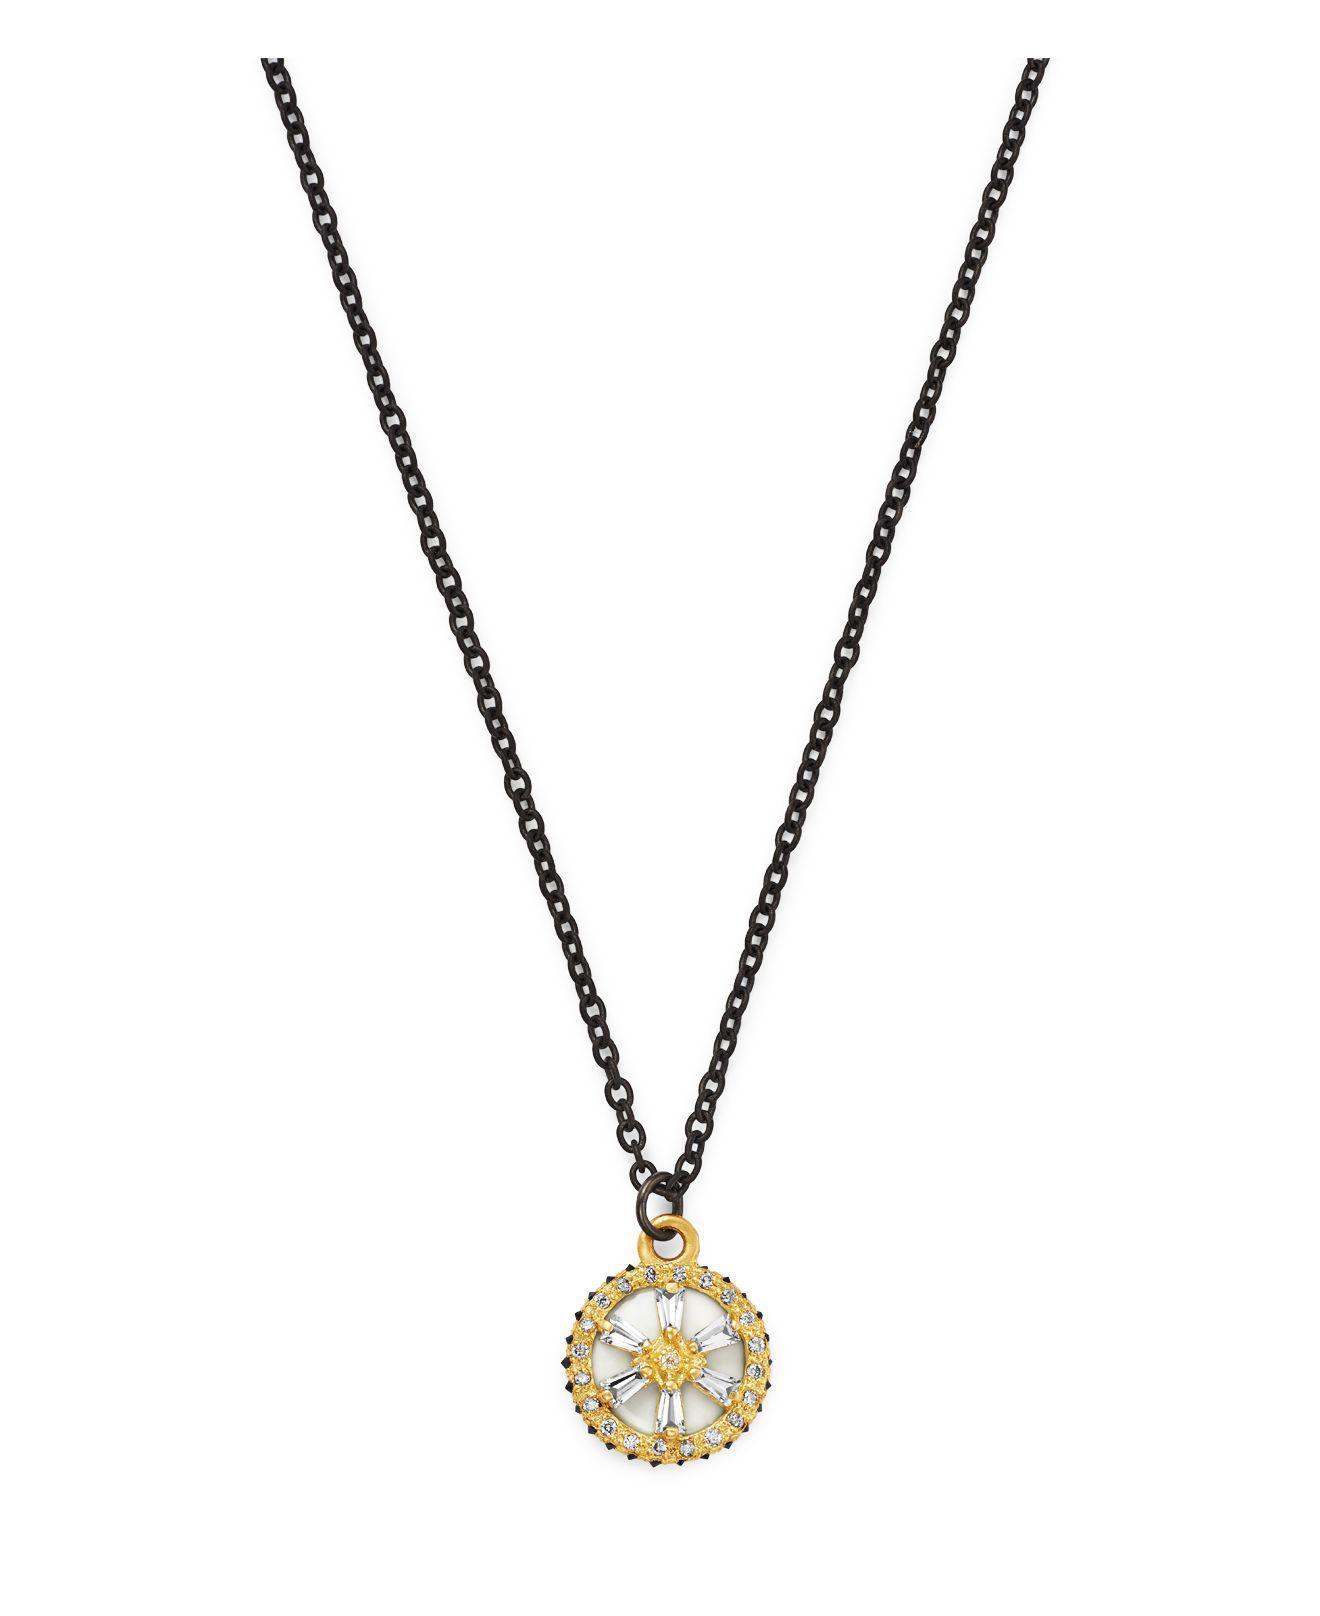 Armenta Old World 18k Diamond Star Pendant Necklace Sr4j2